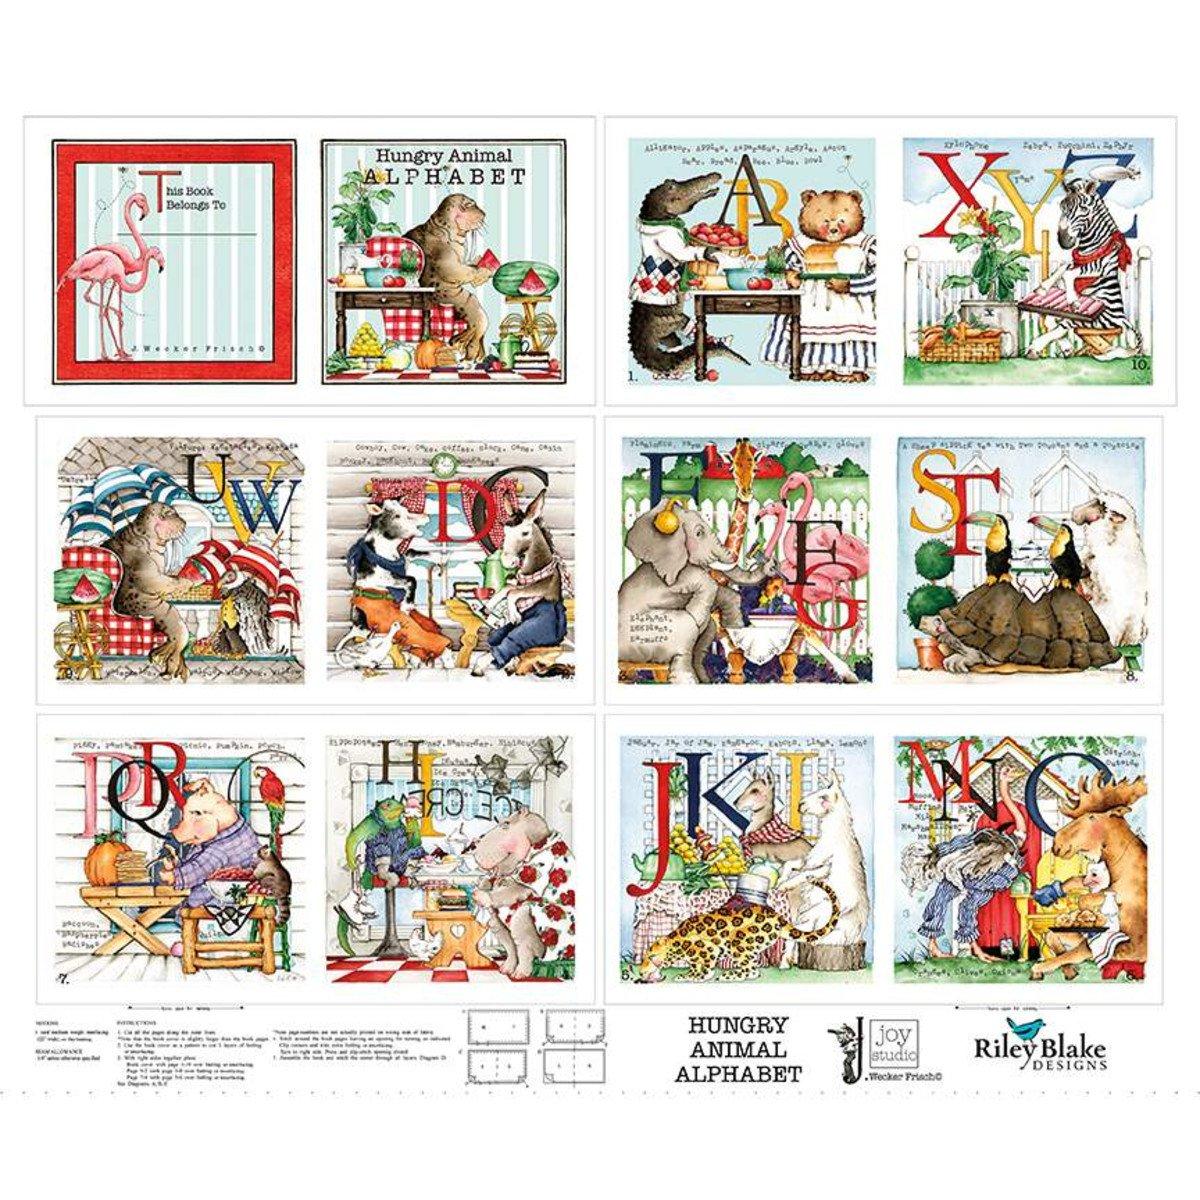 Hungry Animal Alphabet Soft Book Panel